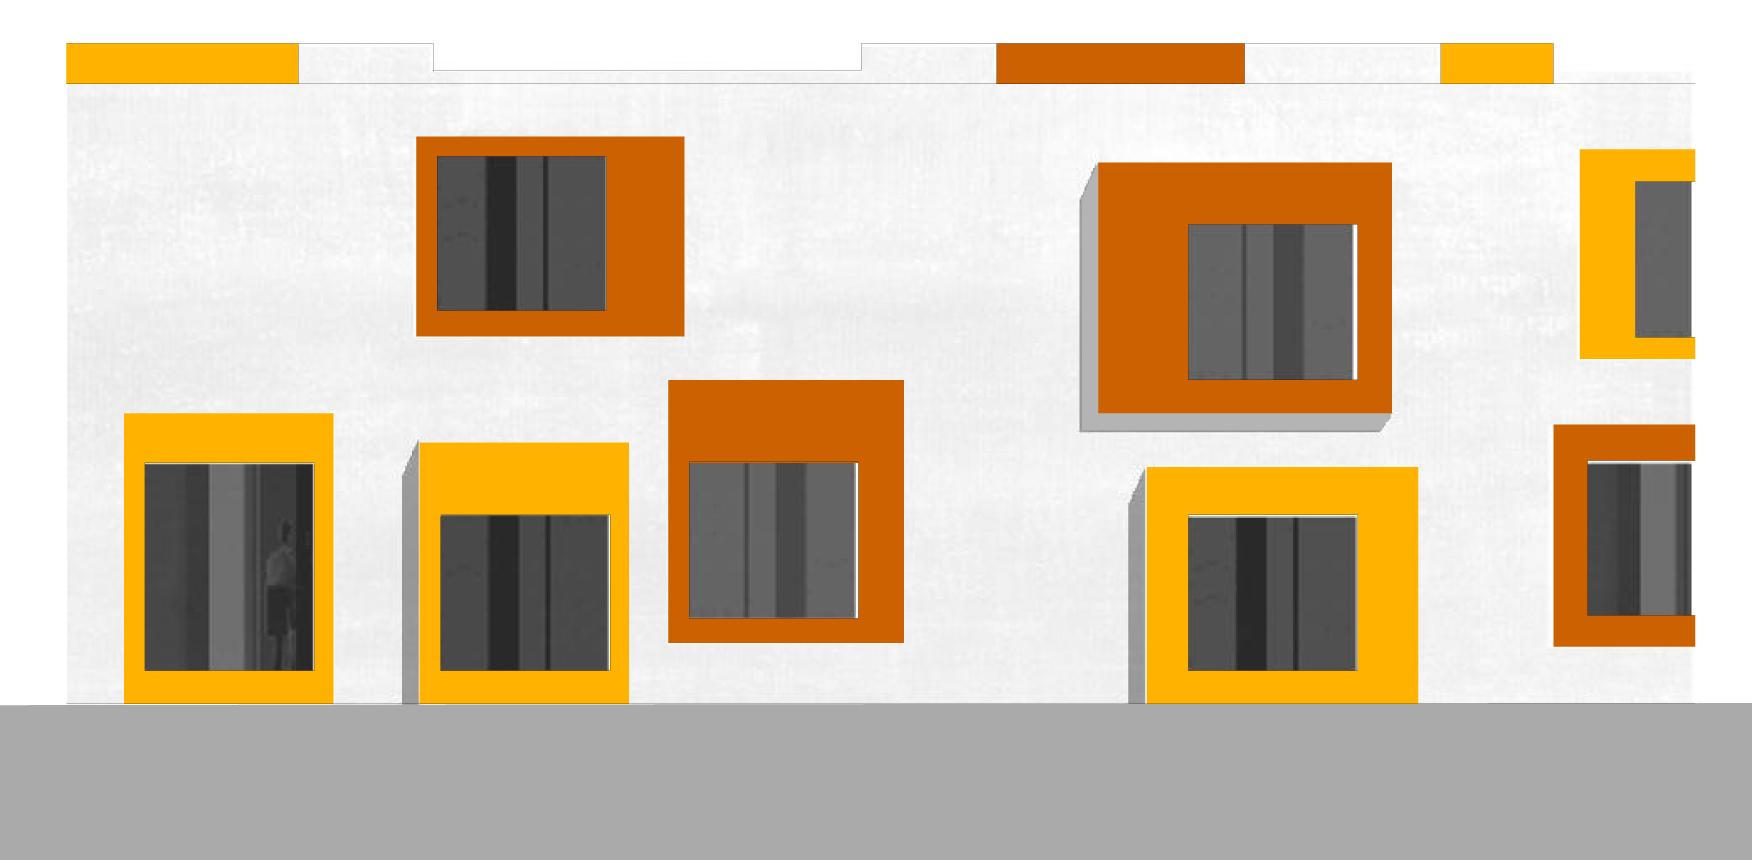 009+Kita+Bukarest-+Fassade.jpg